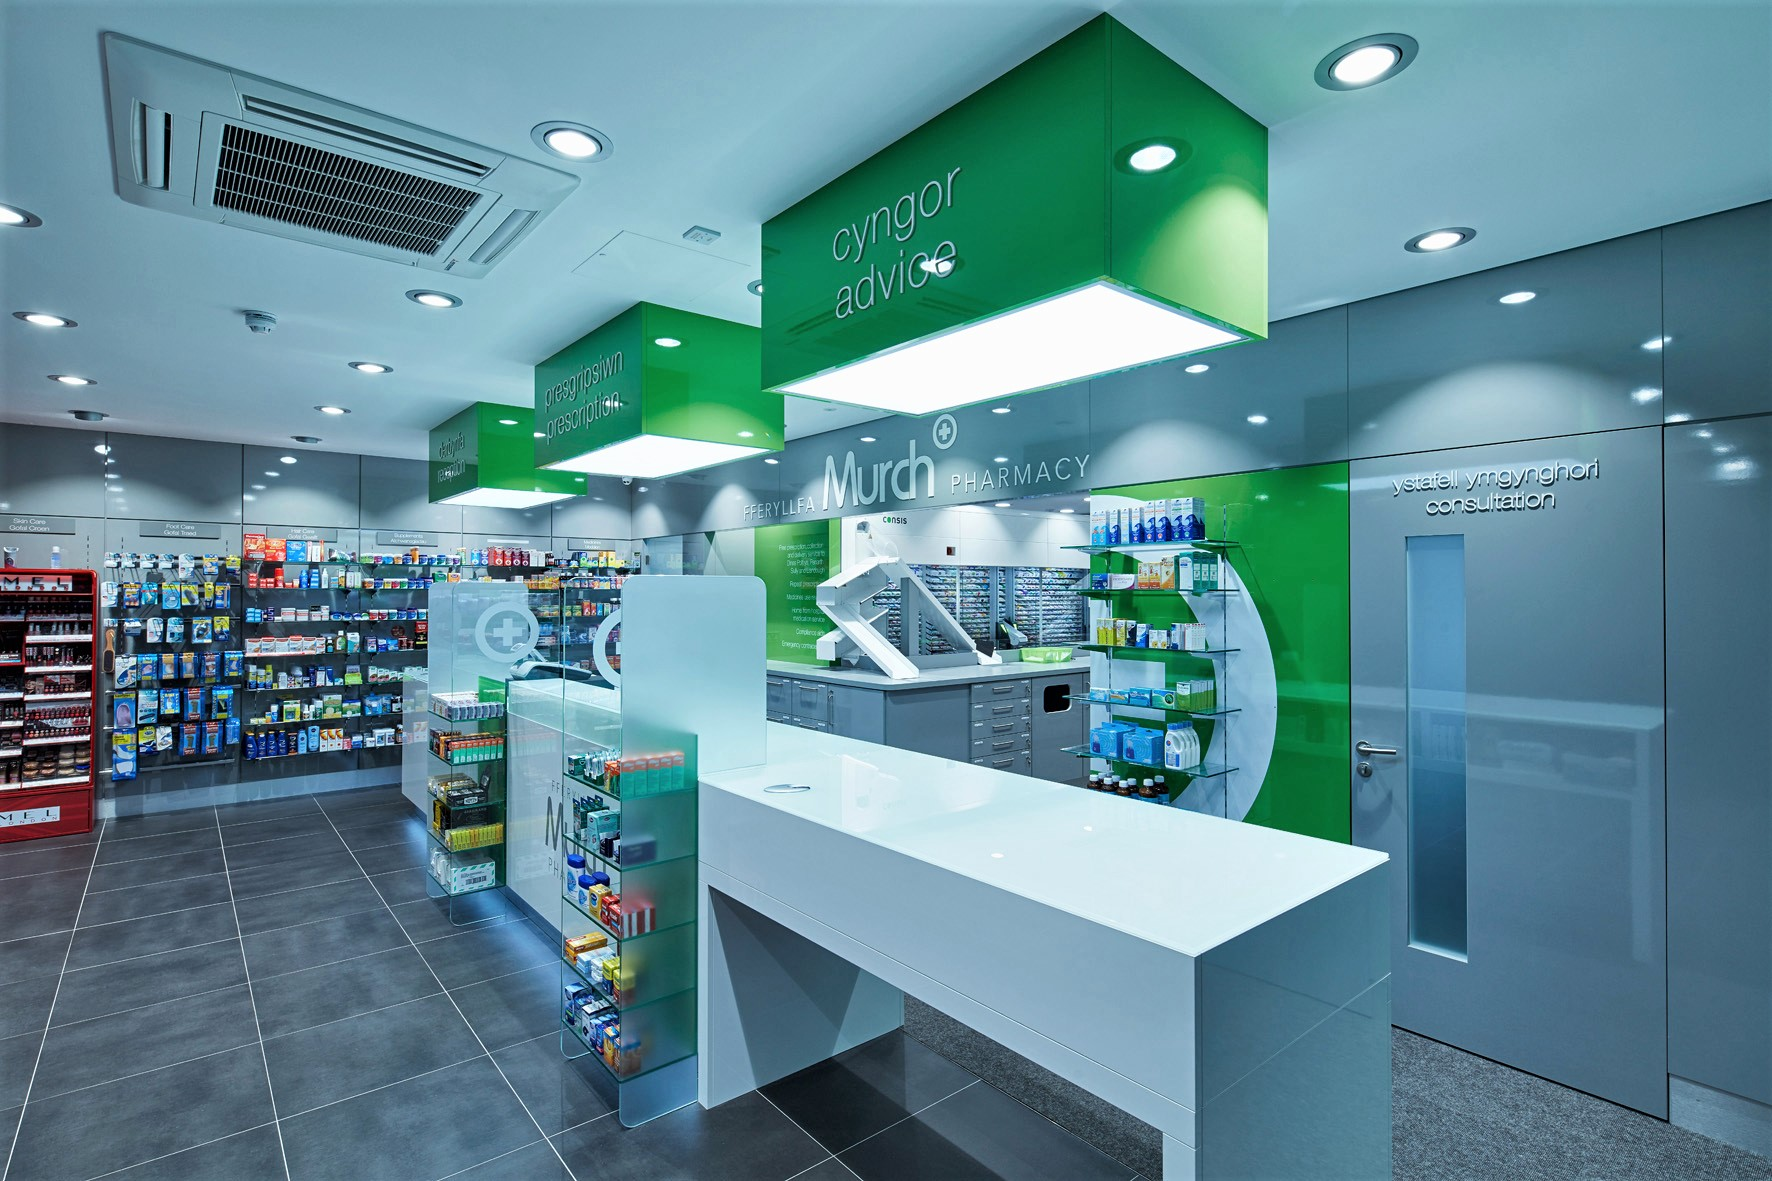 Murch Pharmacy